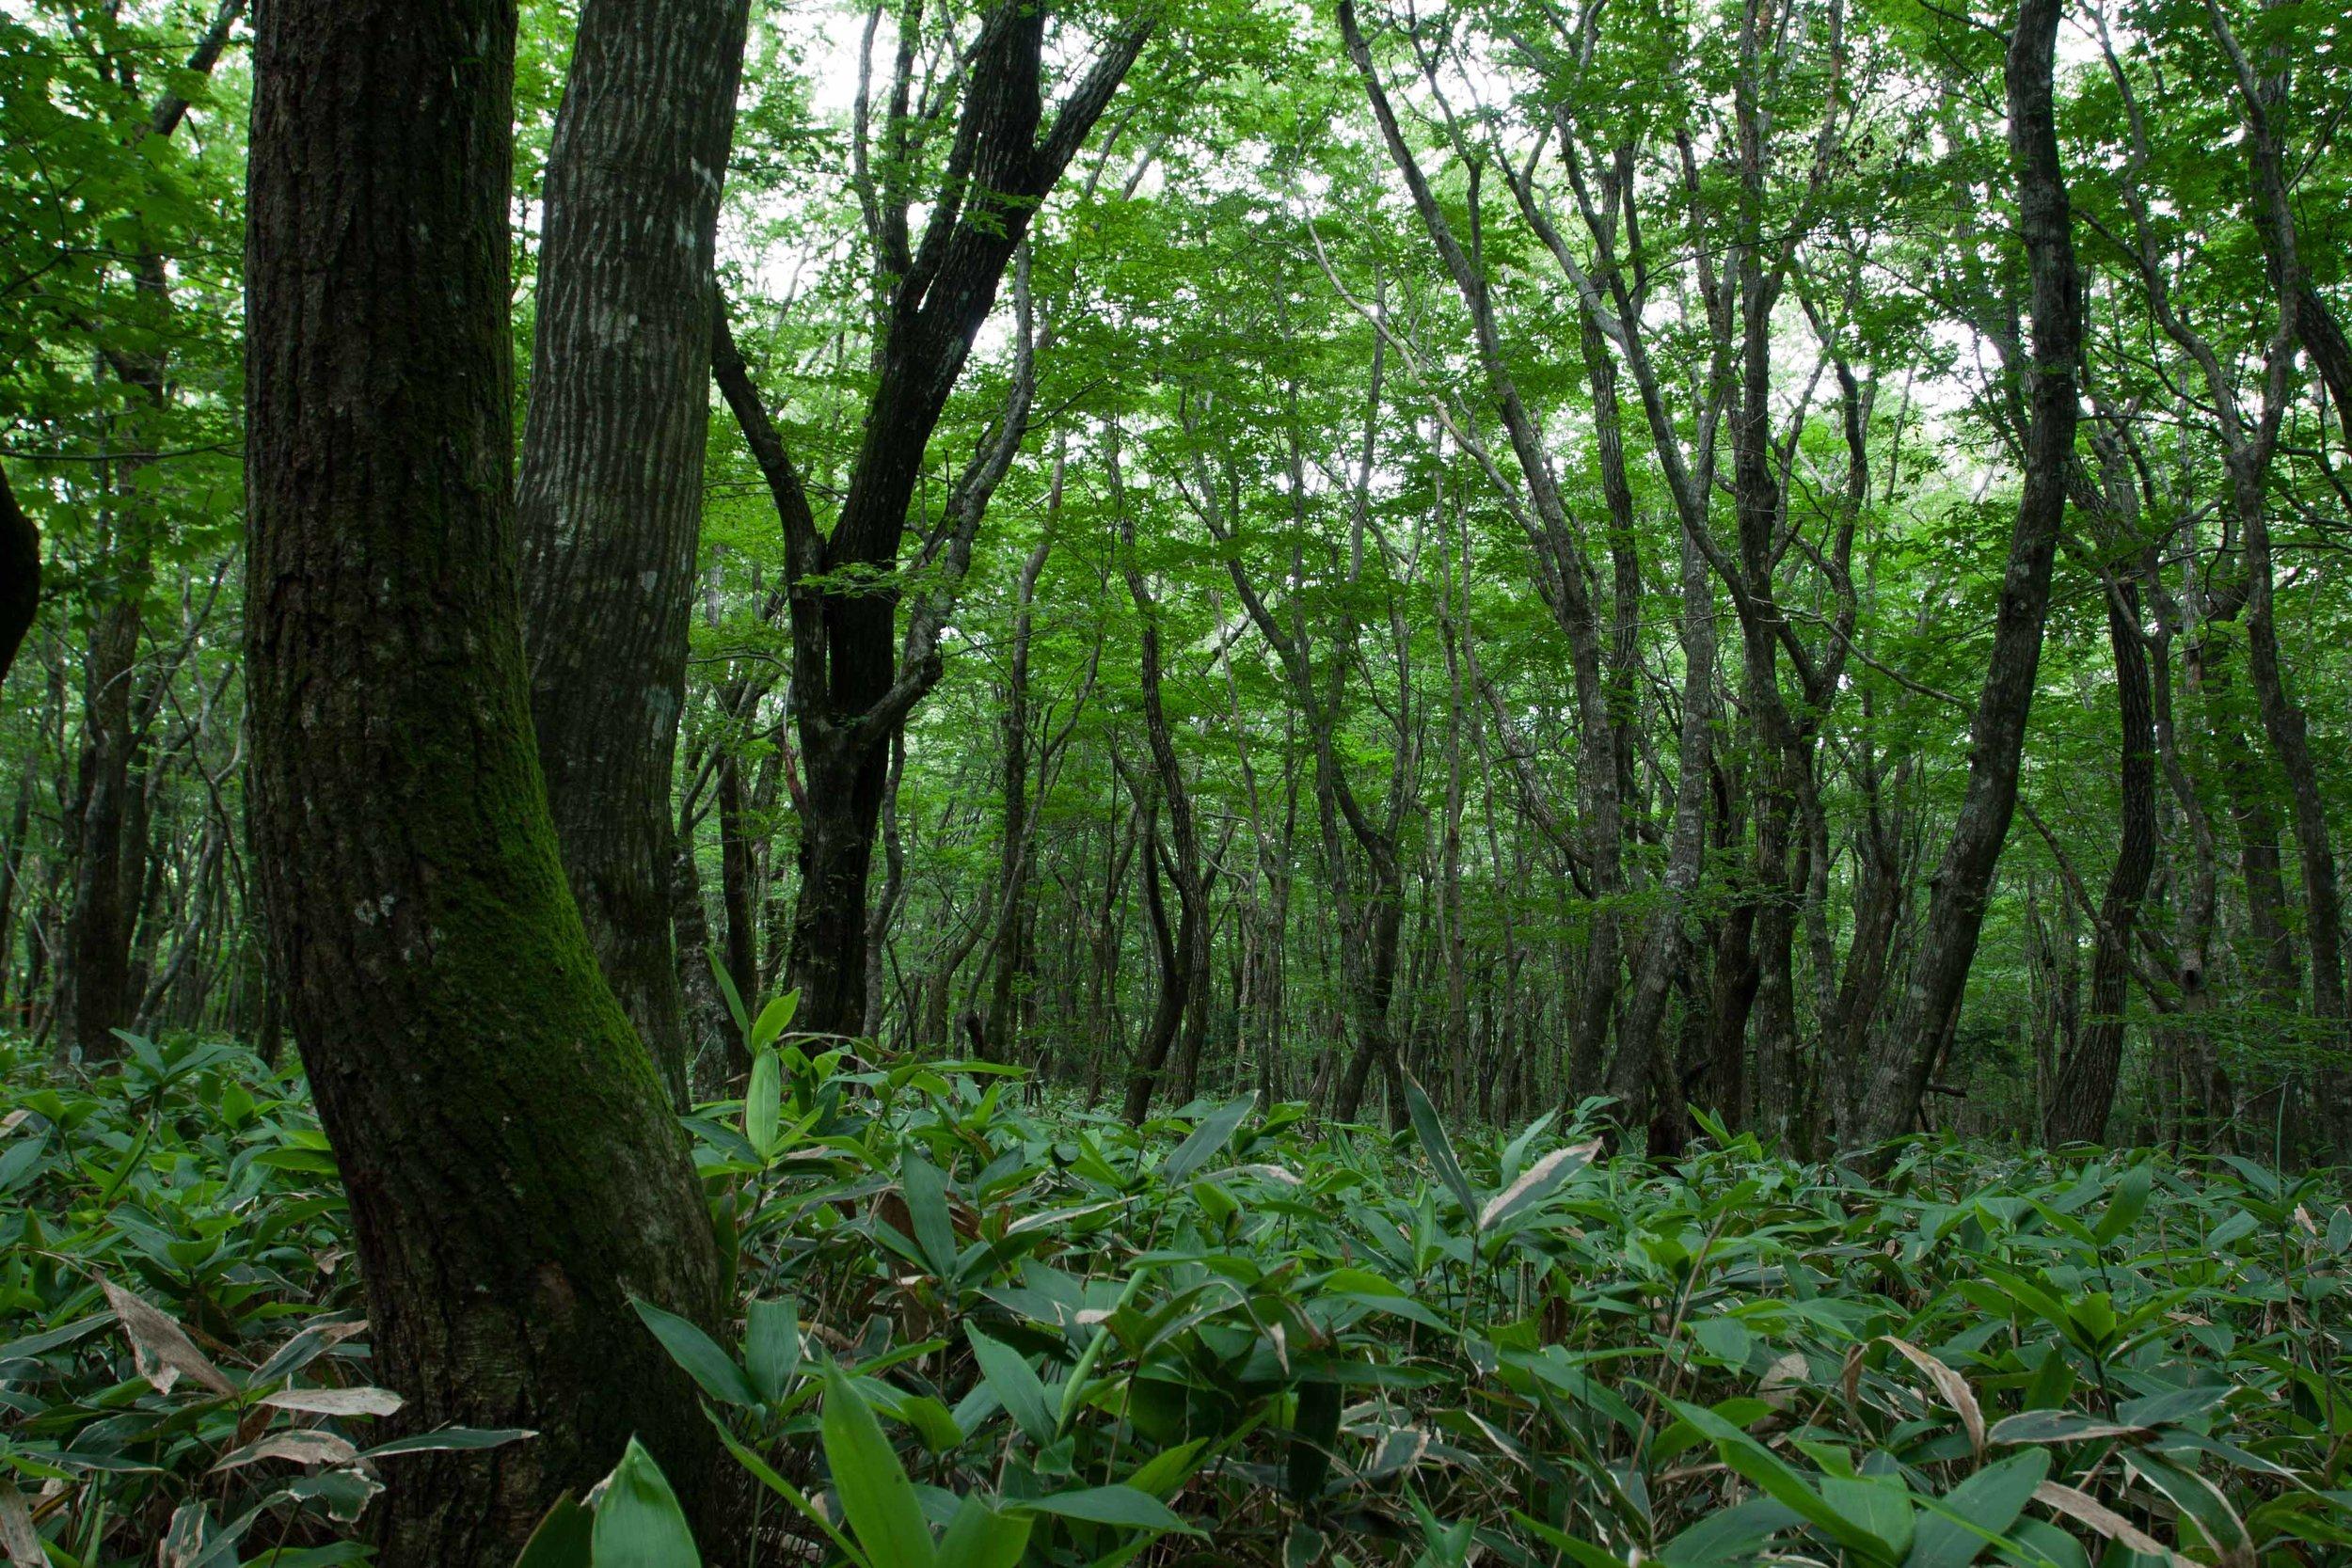 Woodland on Hallasan, Jeju Island, South Korea.